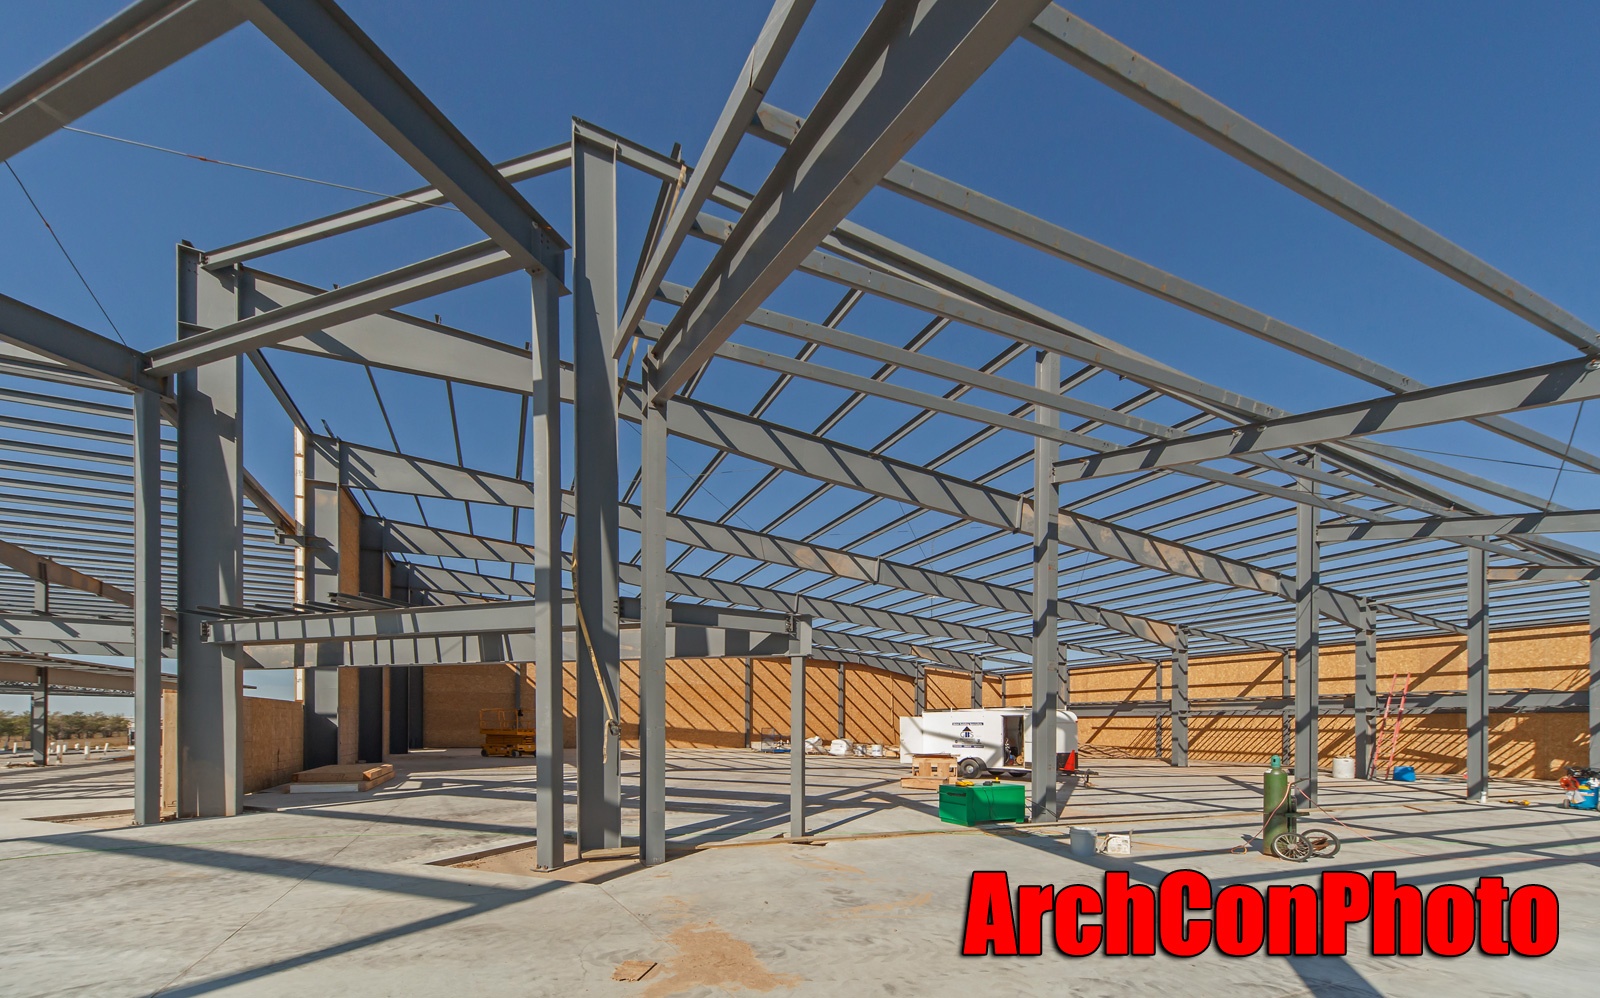 Architectural Photography Archconphoto Construction